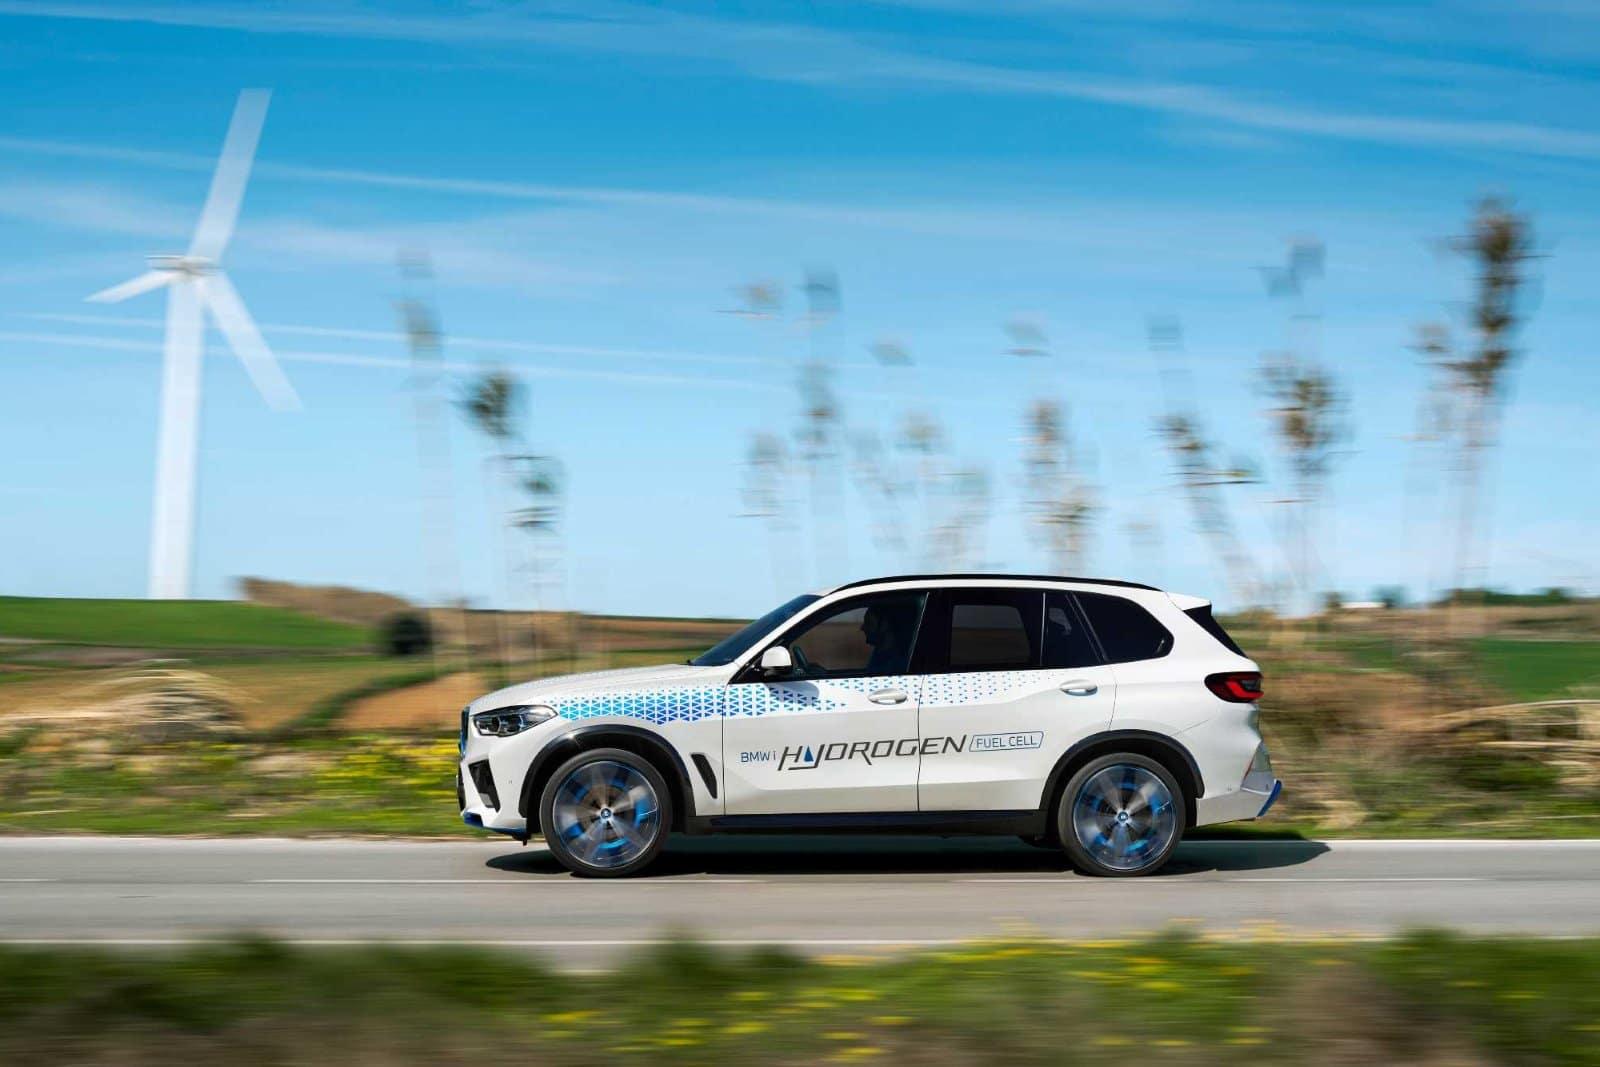 BMW iX5 Hydrogen испытают на выставке IAA Mobility 2021 2